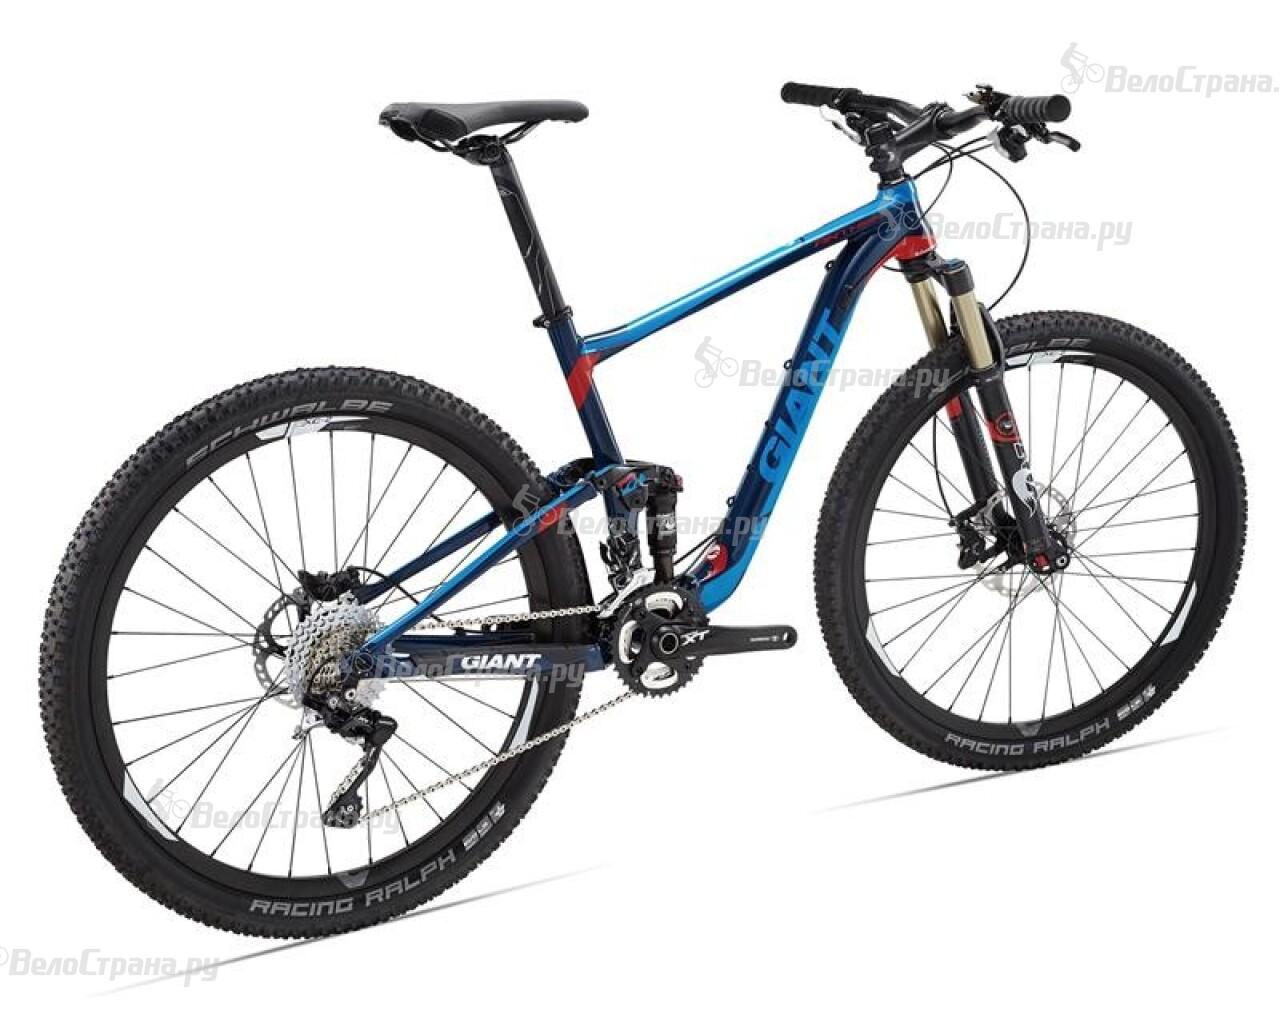 Велосипед Giant Anthem 27.5 1 (2015) anthem pva 7